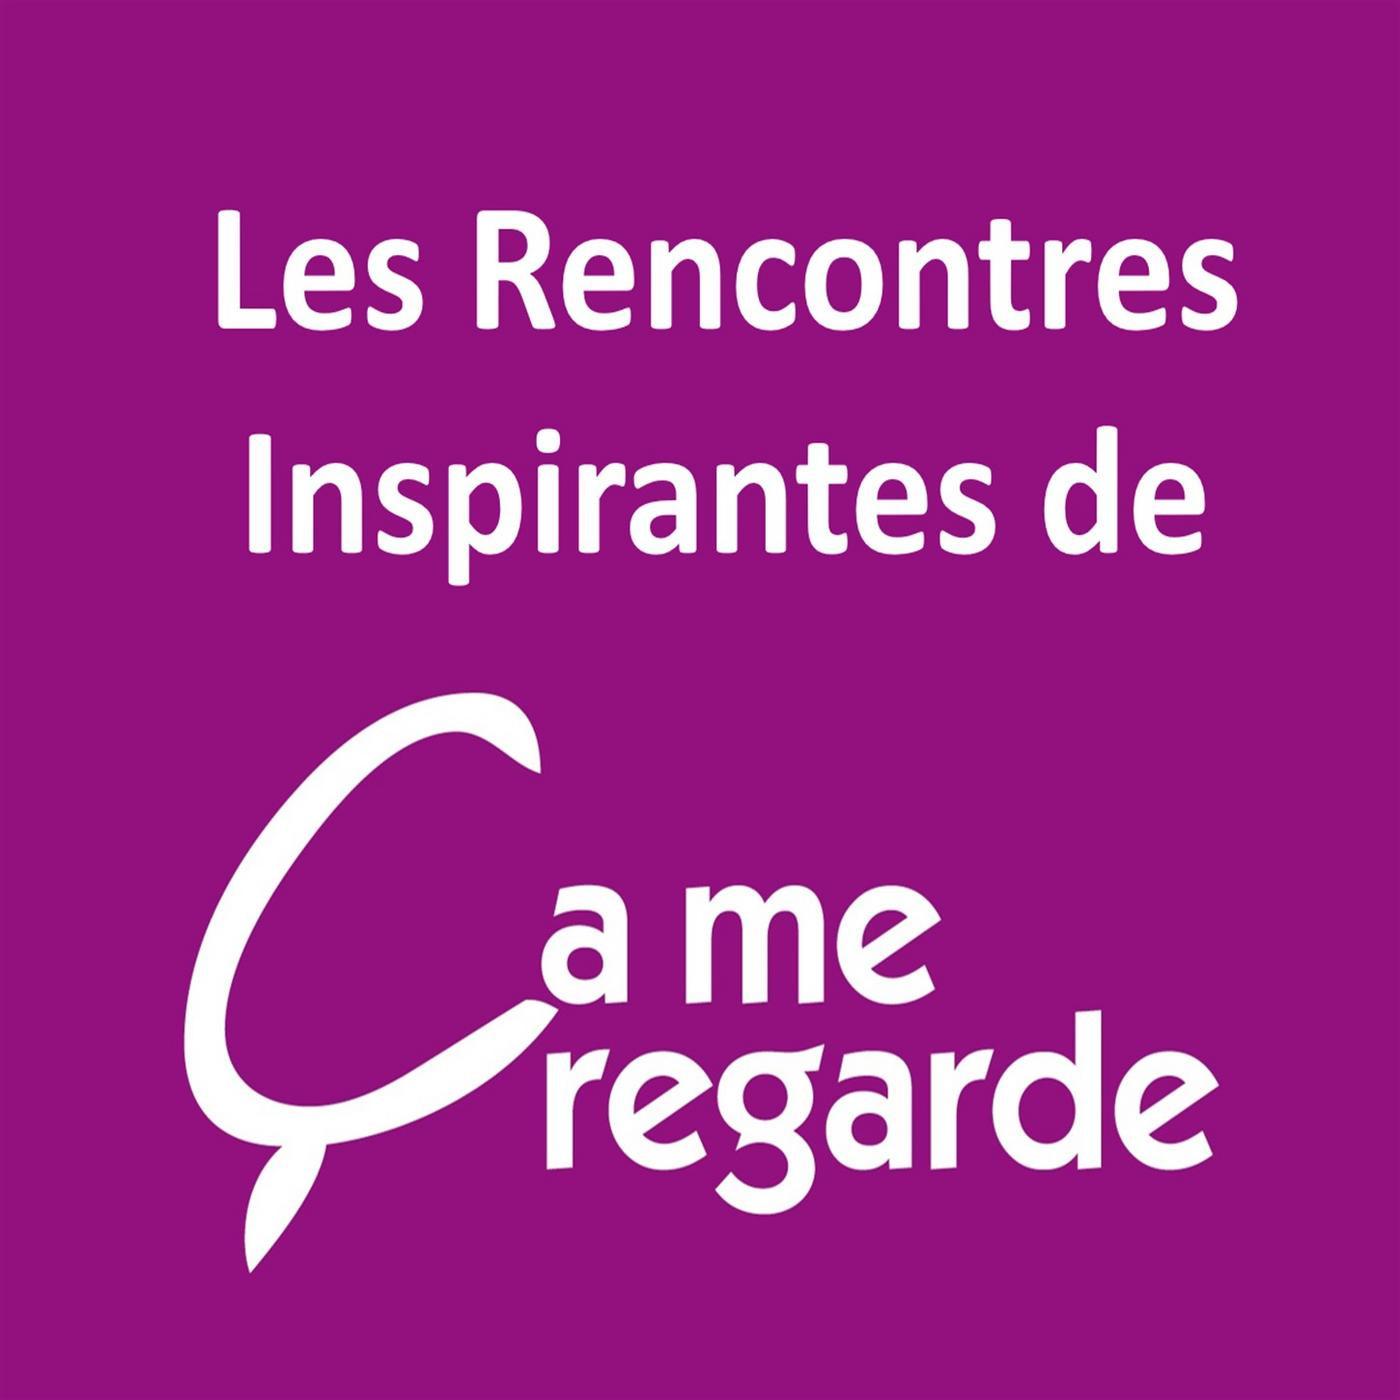 Les Rencontres Inspirantes - Episode 1 : Guillaume Bapst